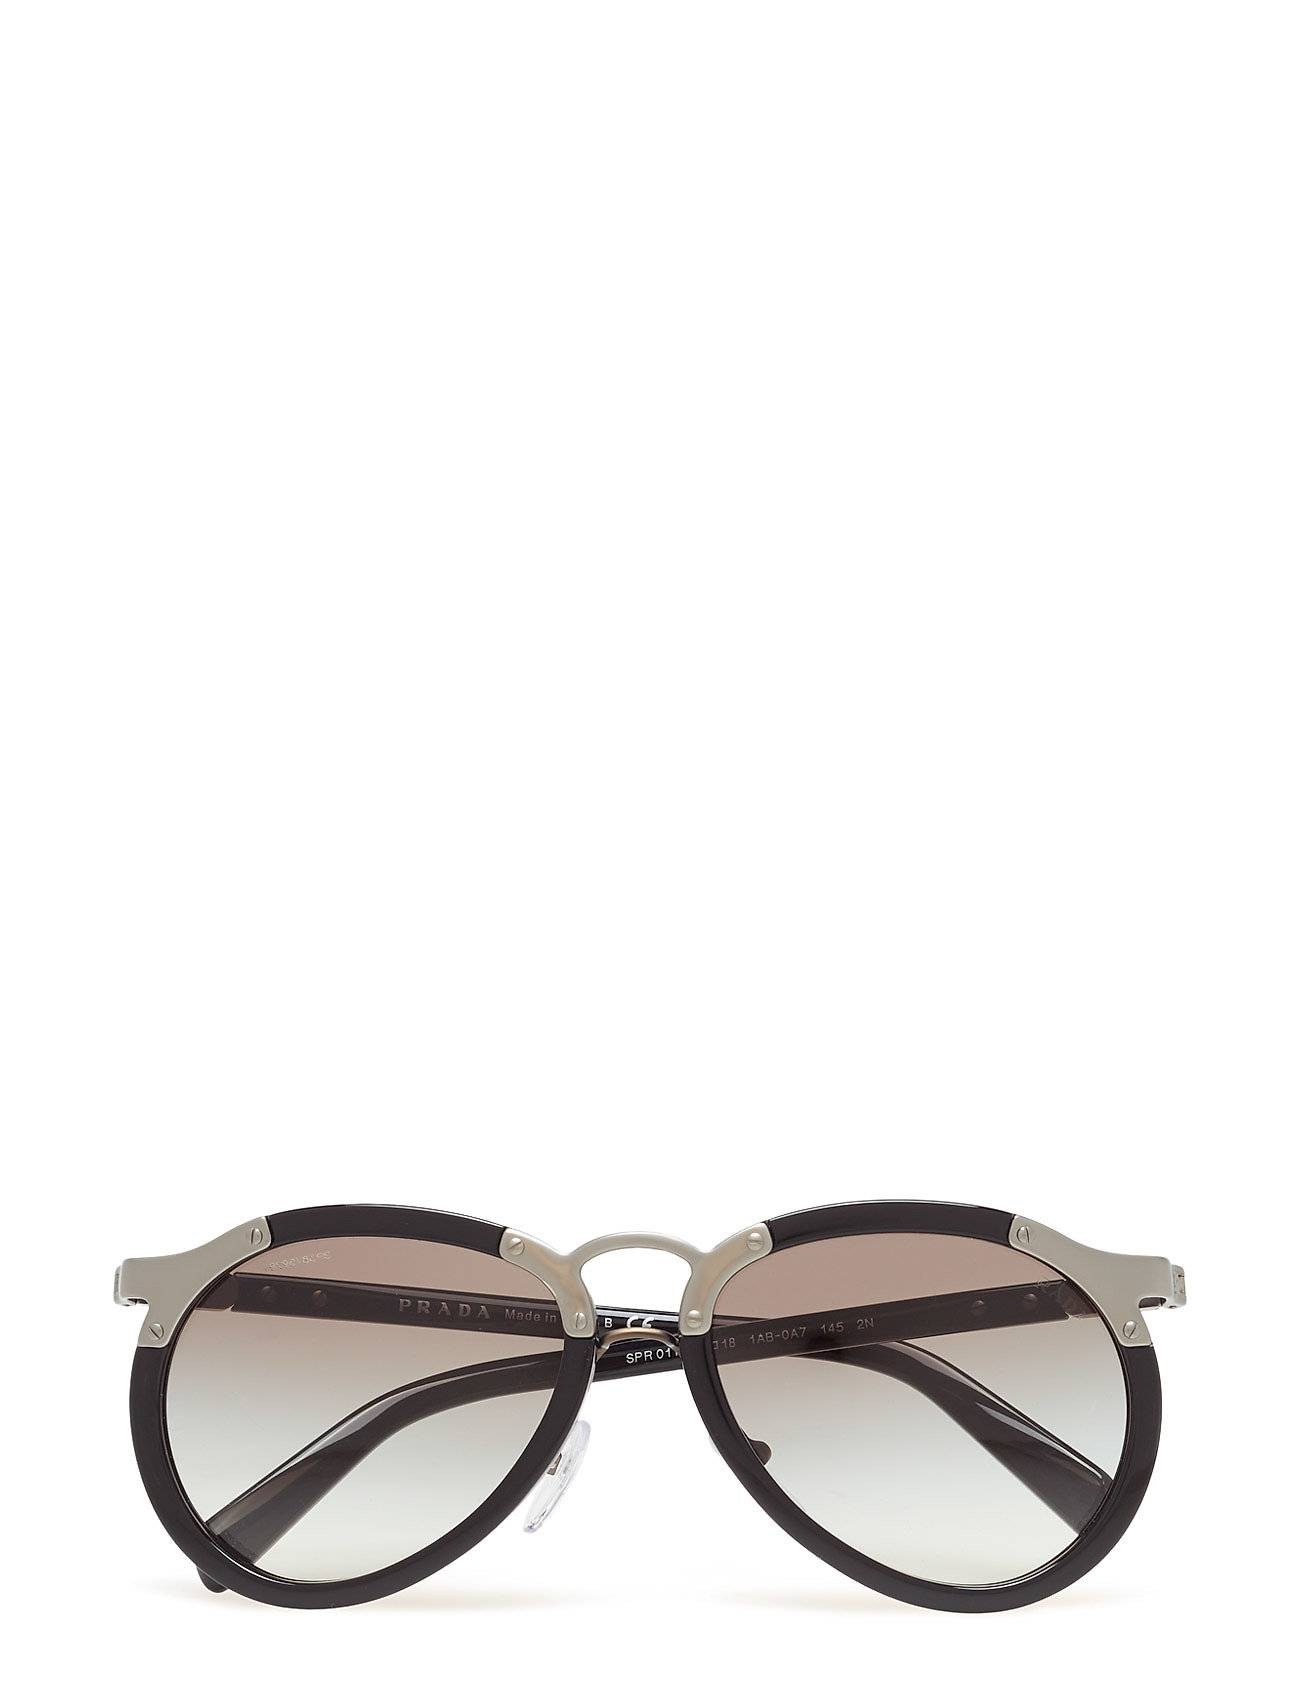 Image of Prada Sunglasses Catwalk Pilottilasit Aurinkolasit Musta Prada Sunglasses